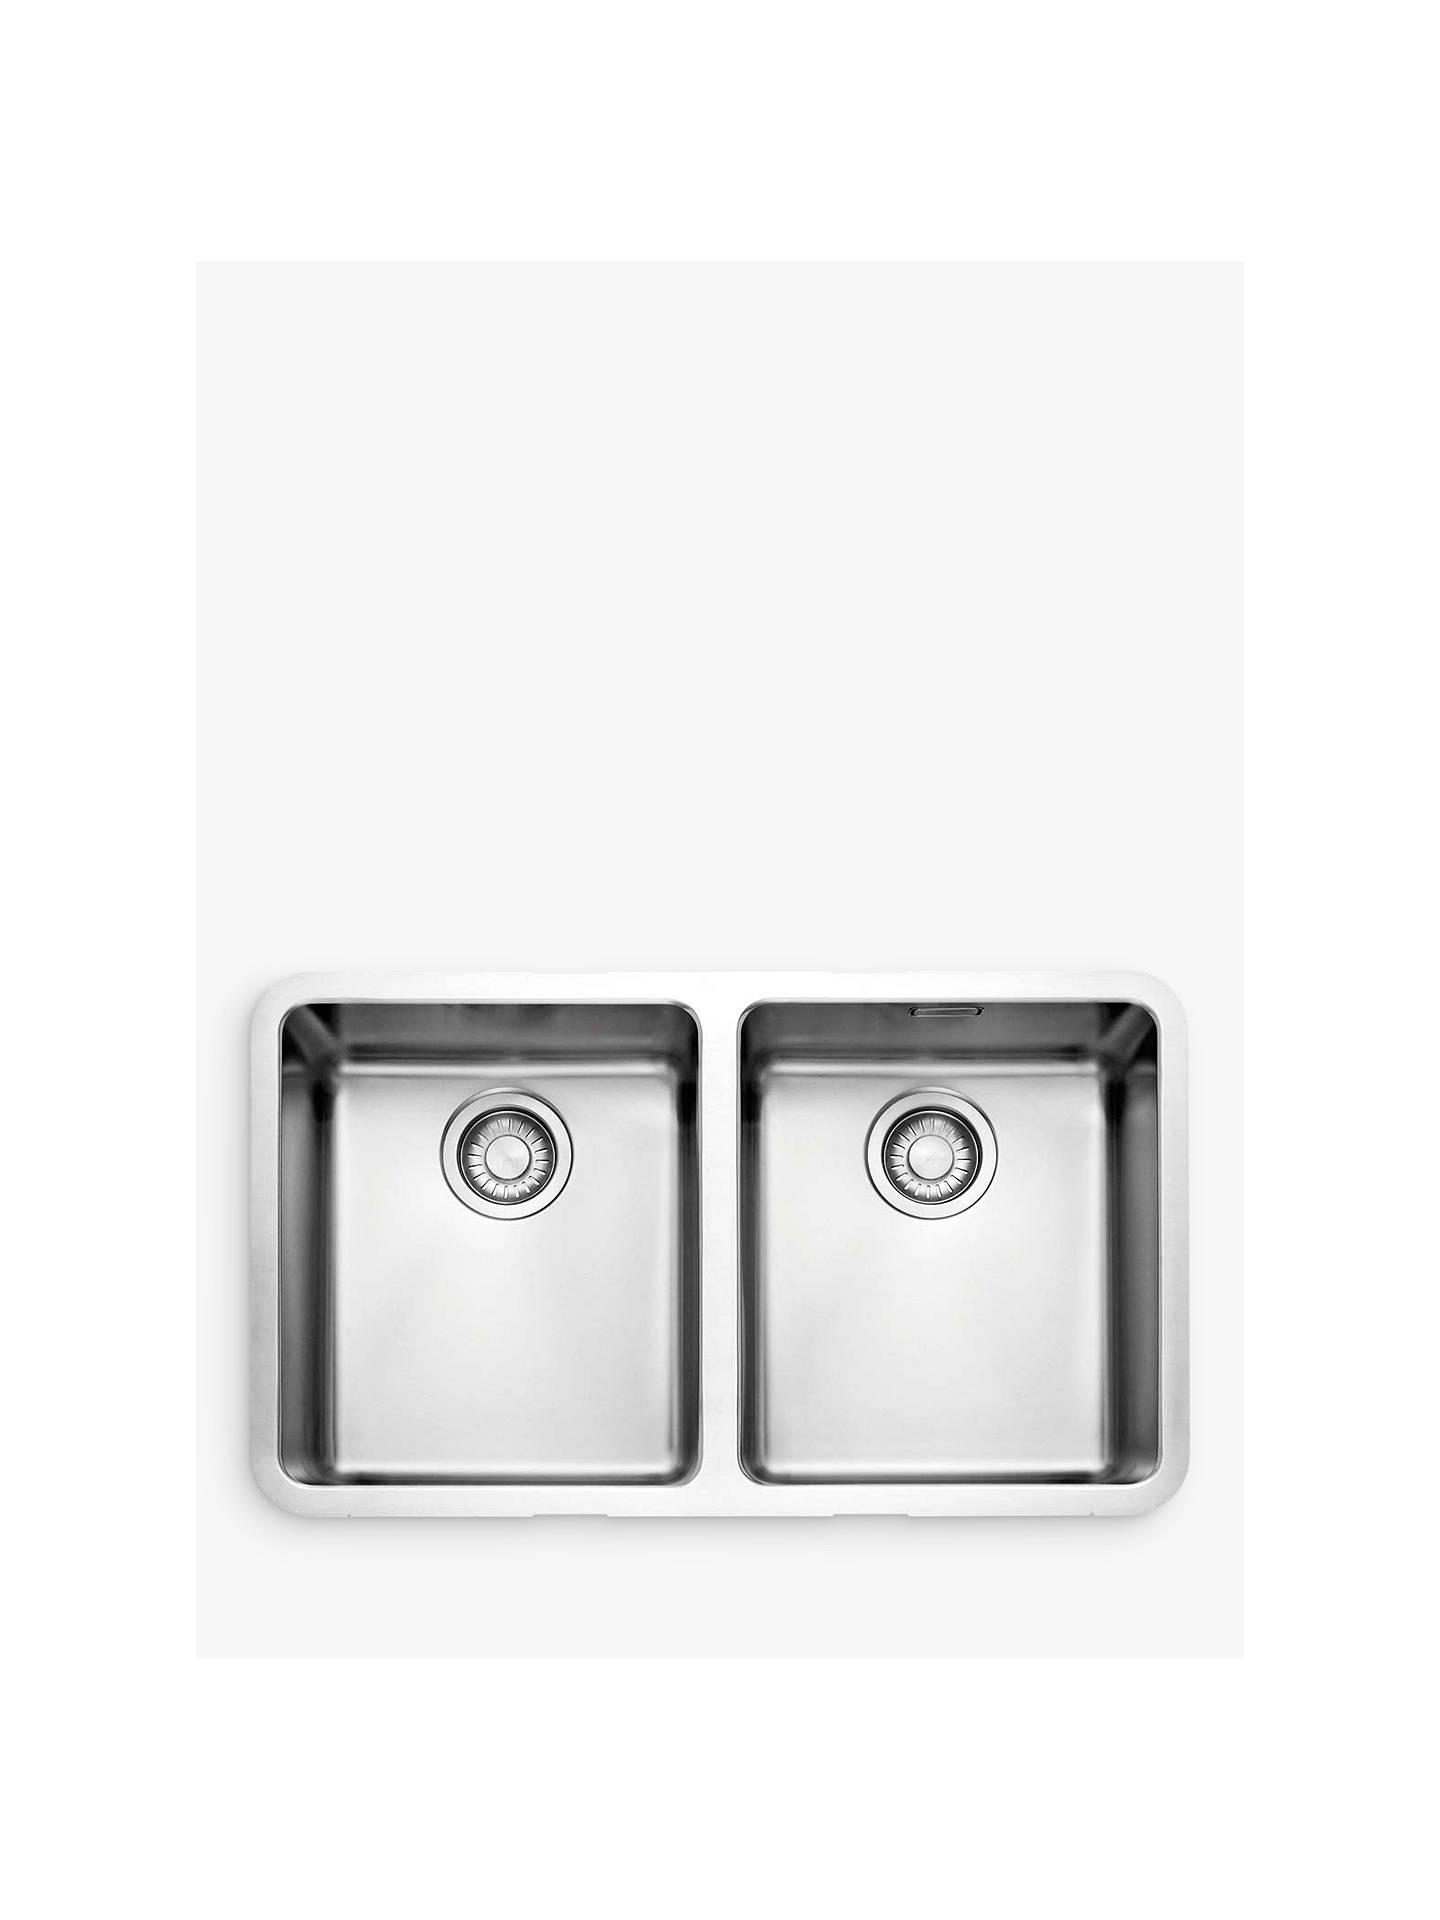 Franke Kubus Kbx 120 34 34 2 Bowl Undermounted Kitchen Sink Stainless Steel